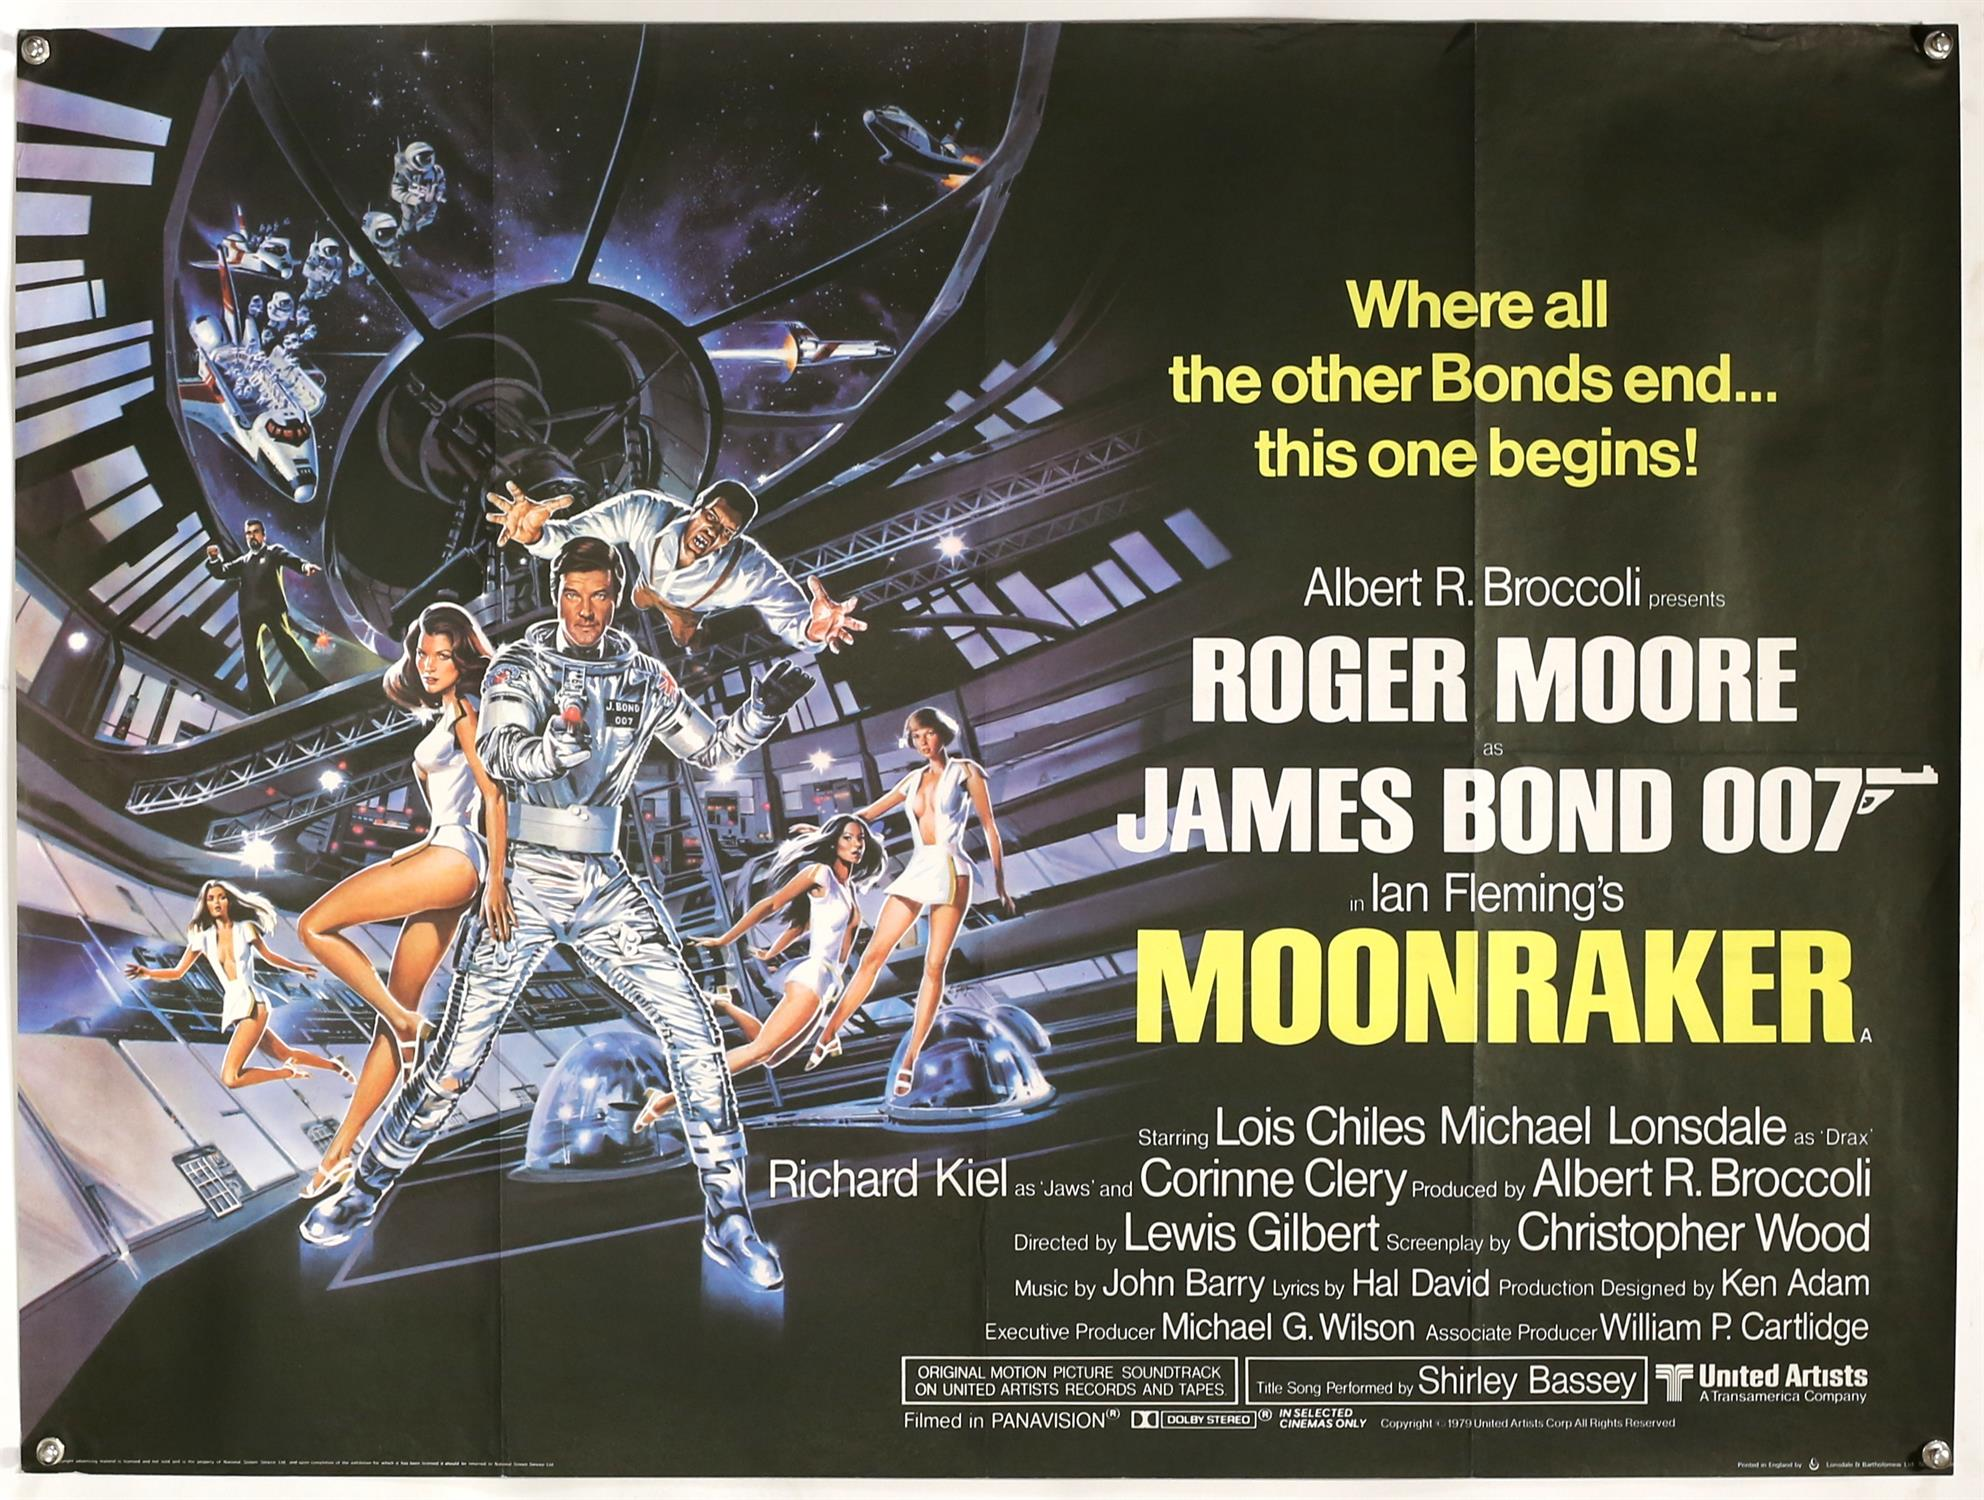 James Bond Moonraker (1979) British Quad film poster, starring Roger Moore, artwork by Dan Goozee,